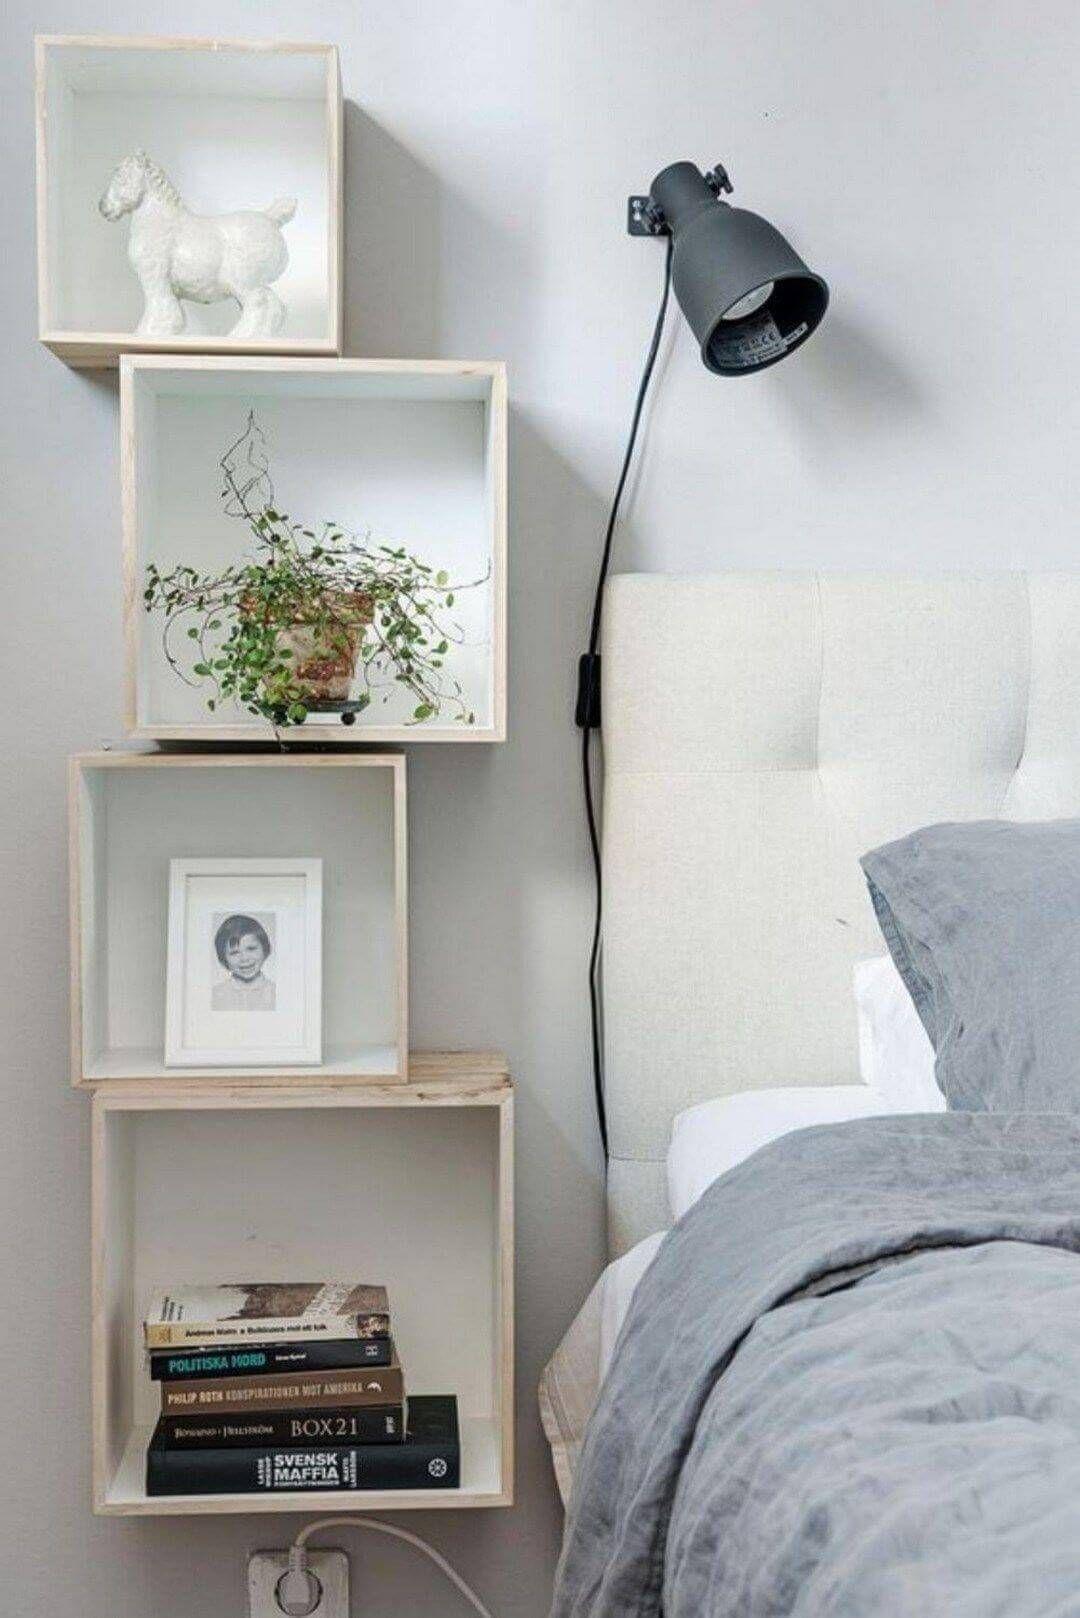 28 Small Bedroom Organization Ideas That Are Smart And Stylish Sharp Aspirant Cheap Bedroom Ideas Simple Bedroom Bedroom Decor